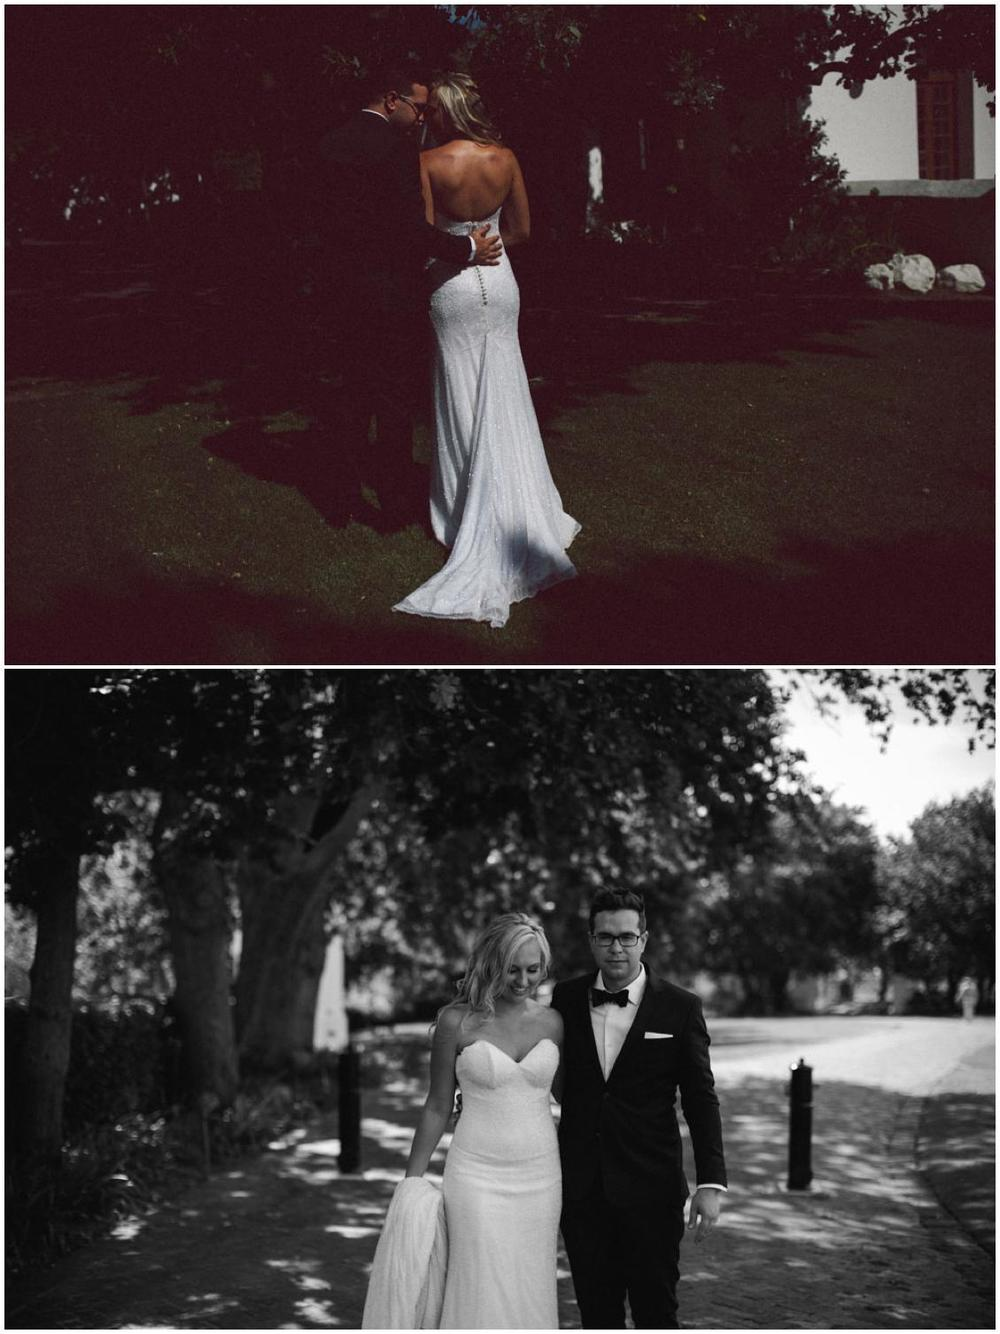 Janlo&Anina_Lanzeraz_Fionaclairphotography-150.jpg